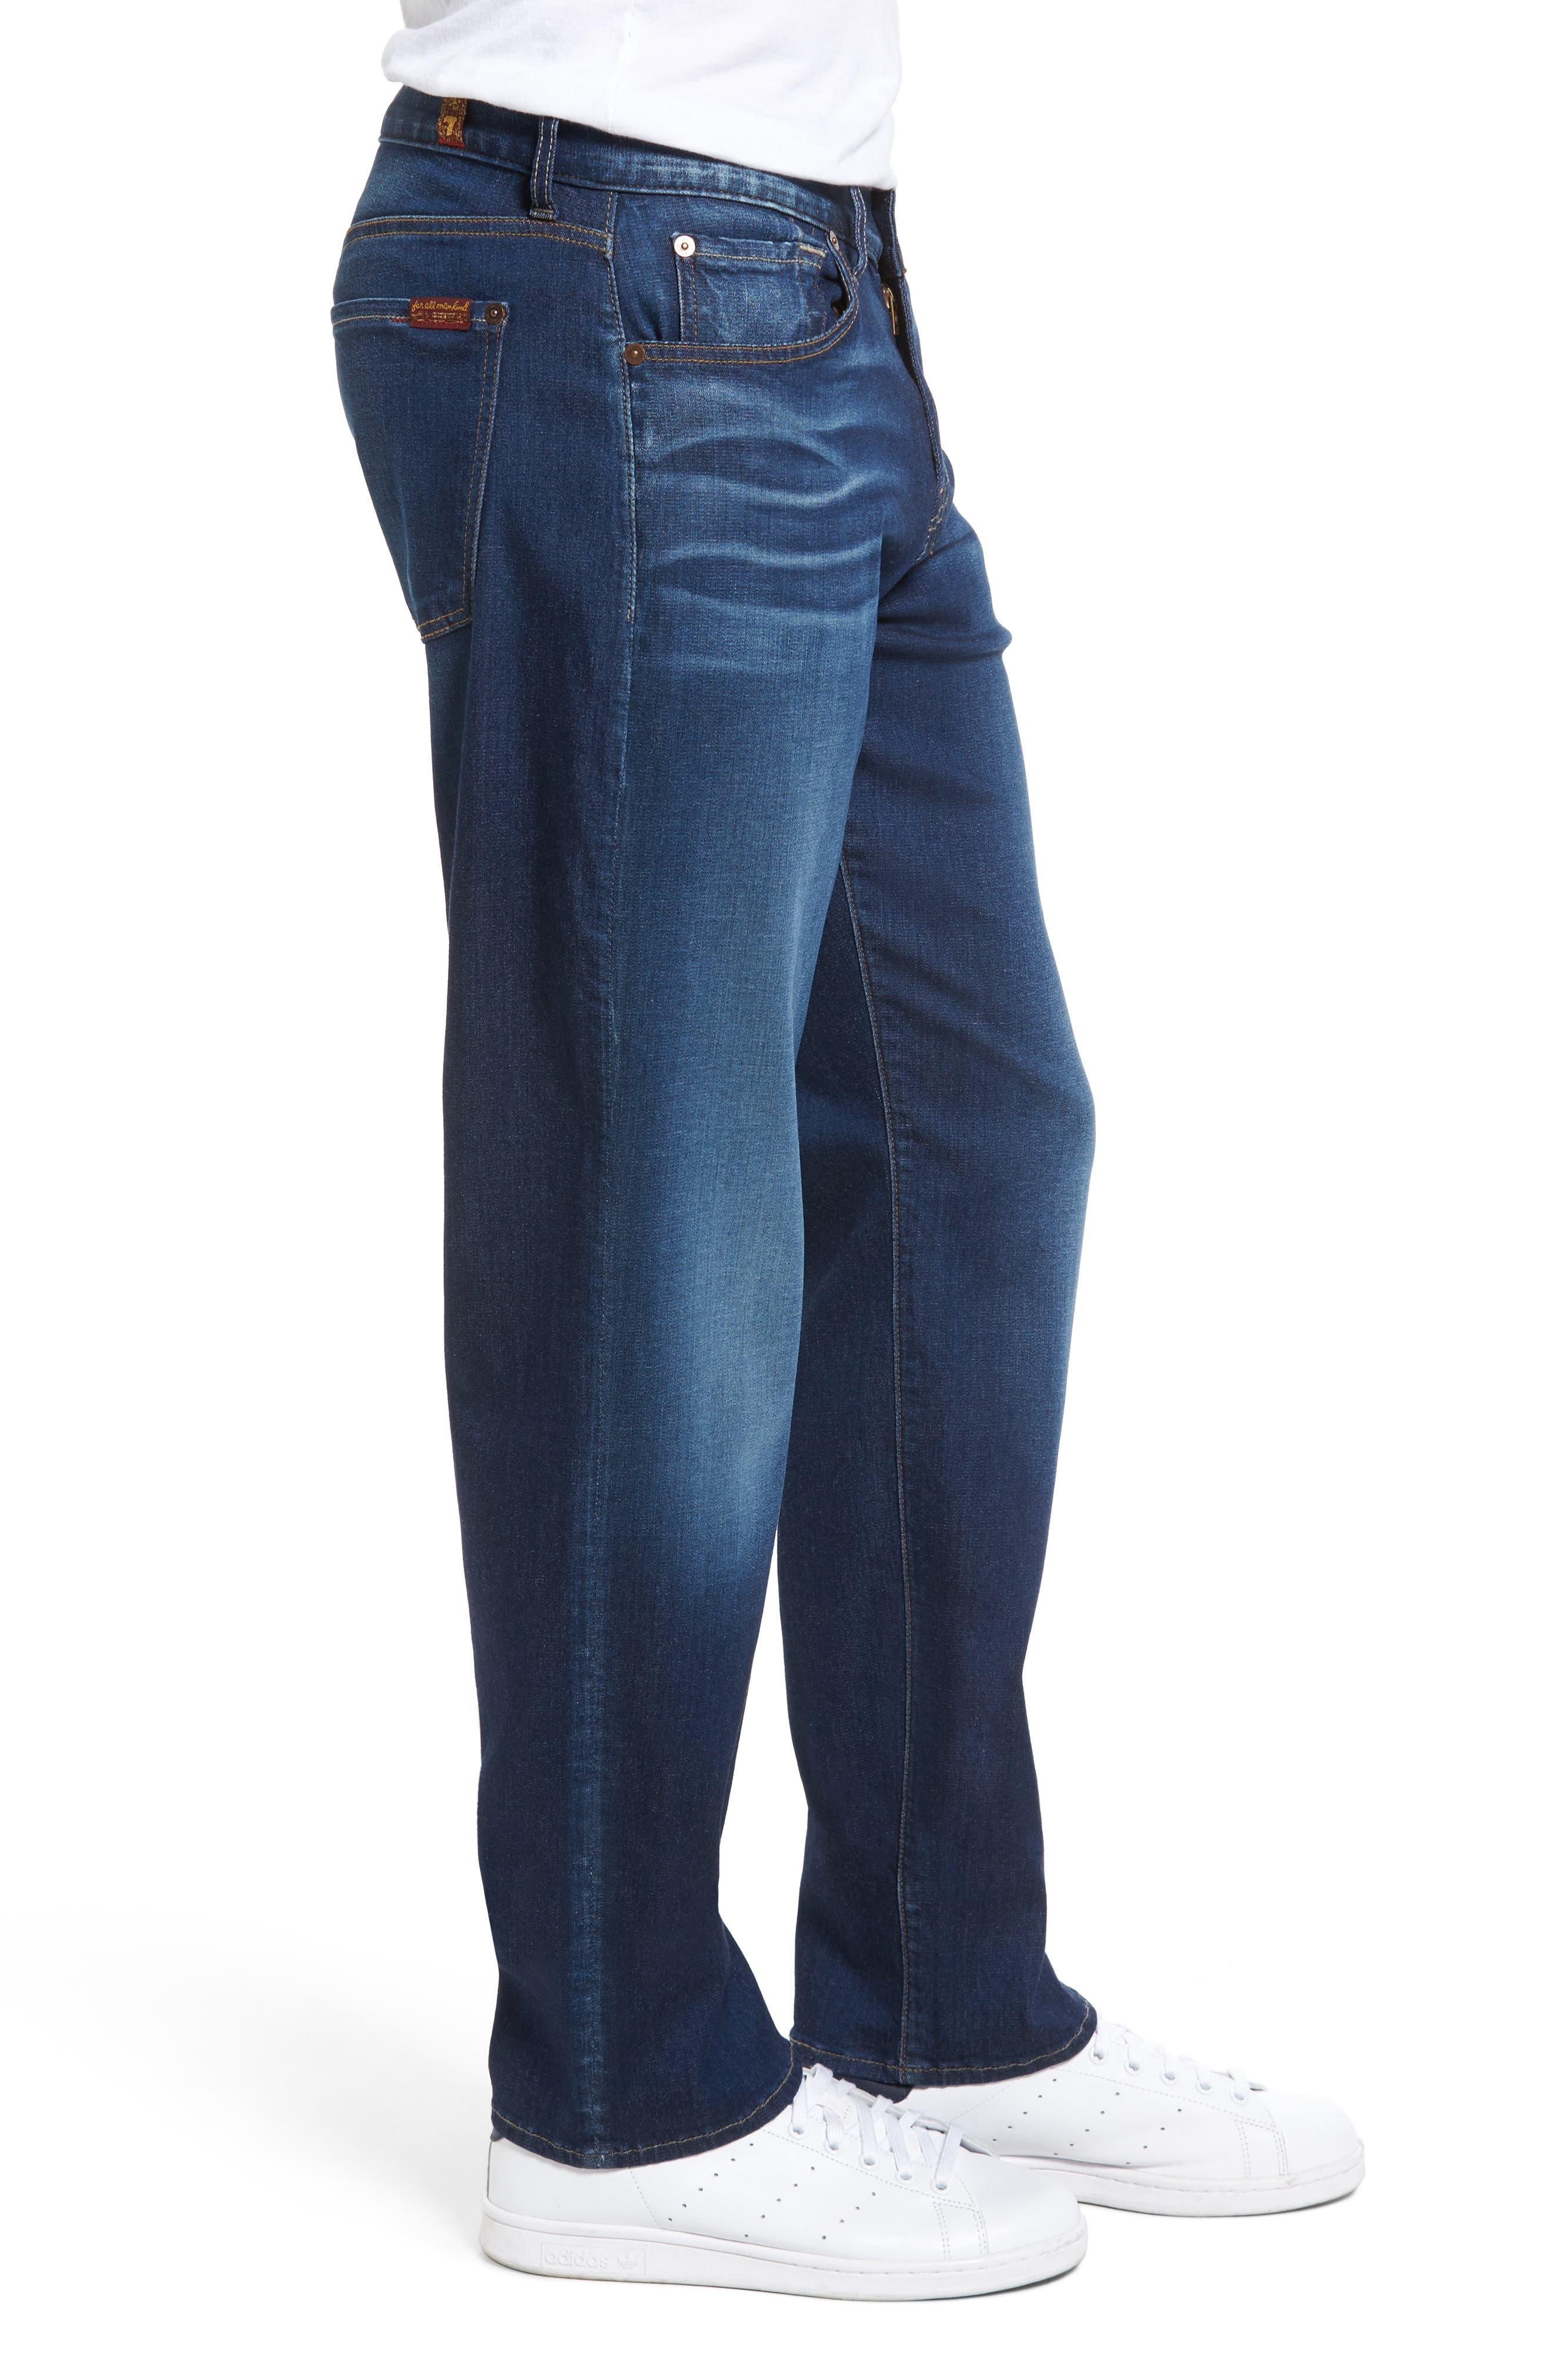 Slimmy Slim Fit Jeans,                             Alternate thumbnail 3, color,                             406